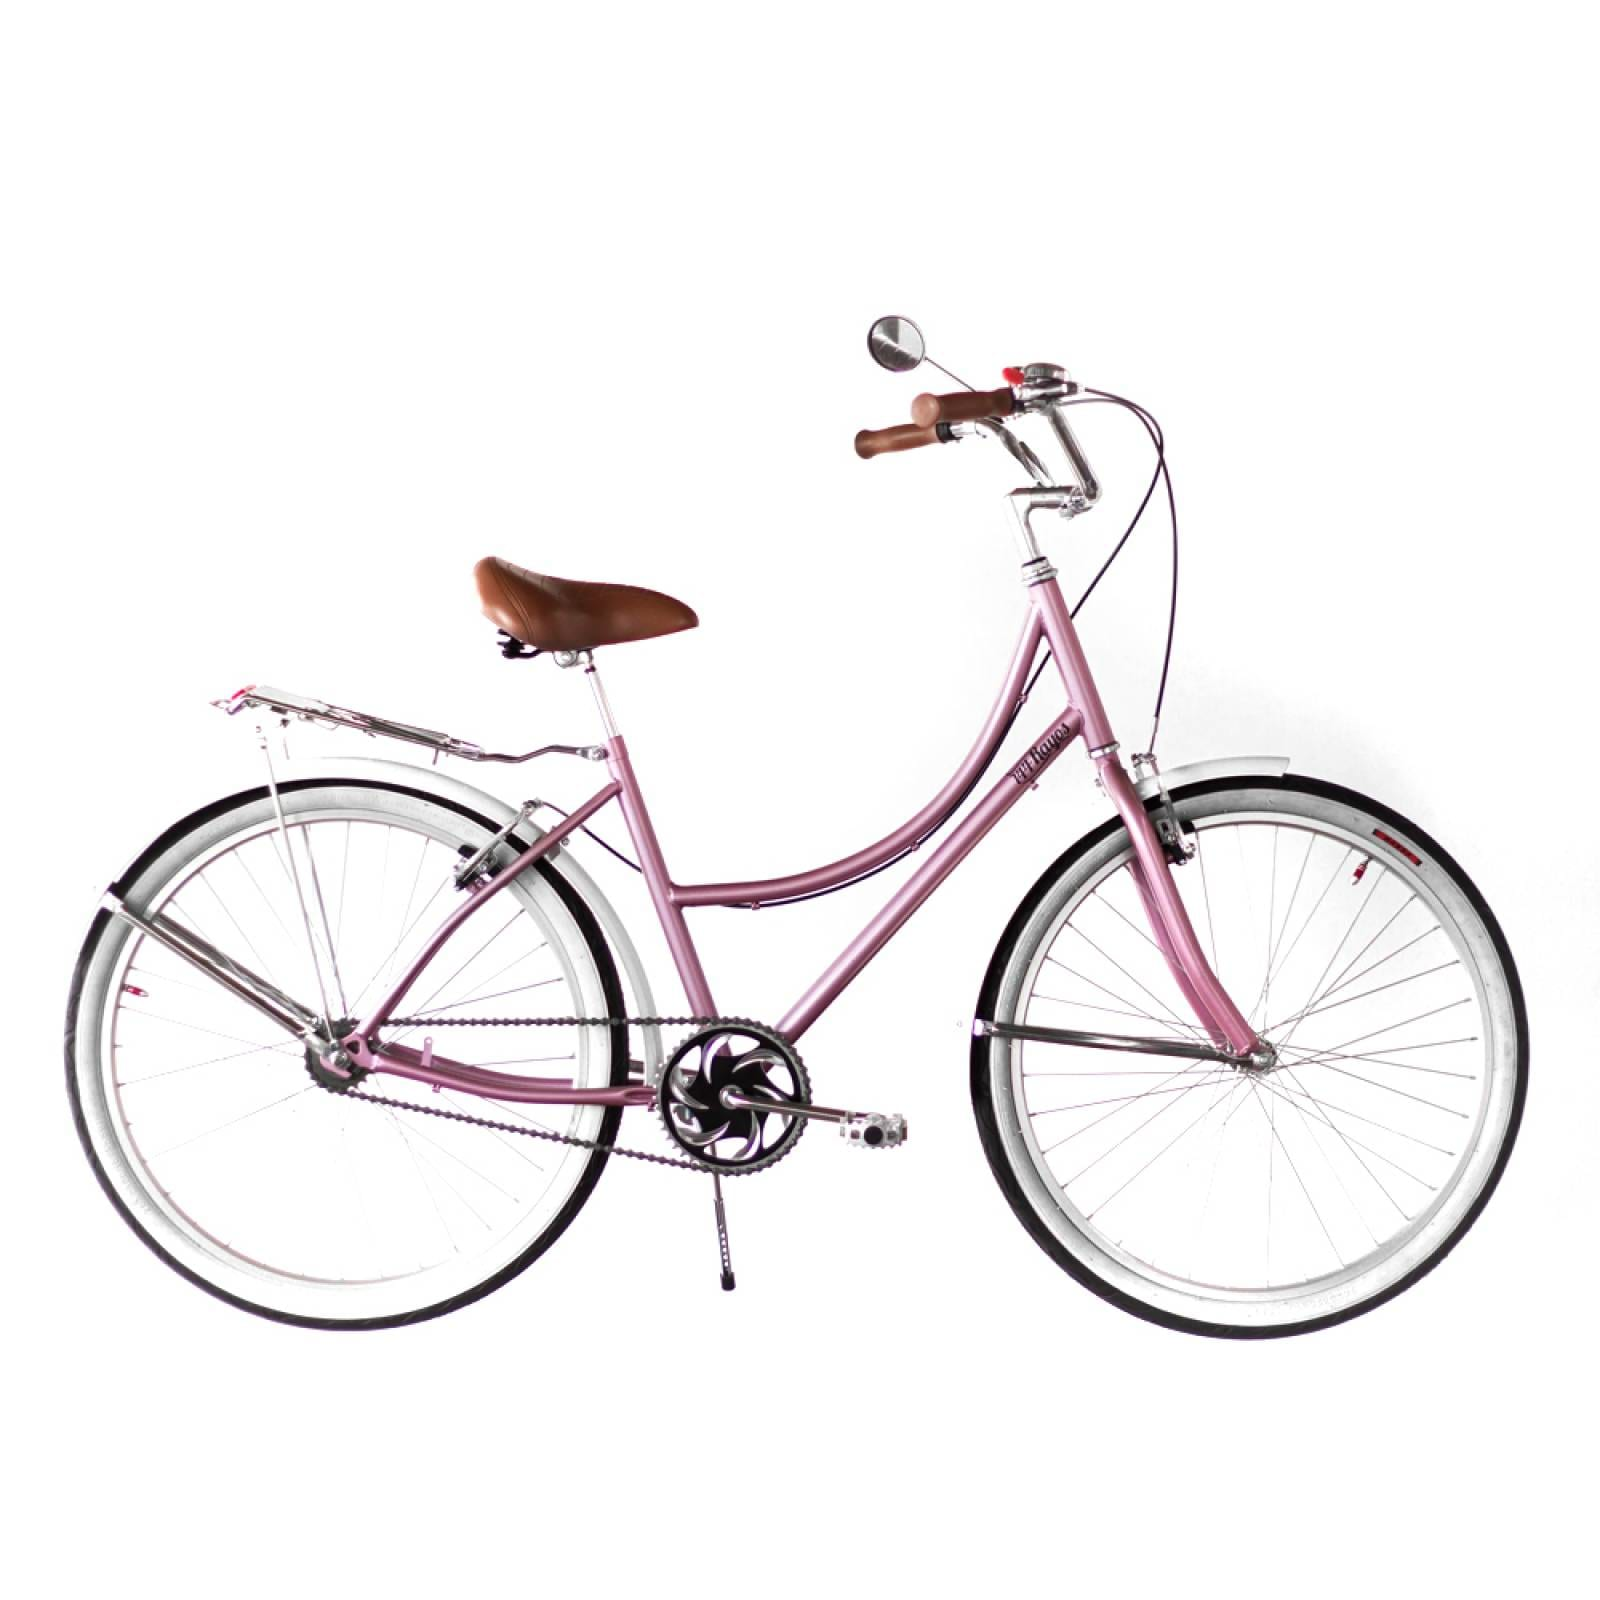 Bici Inglesa36 Rodada 26 Acero Asiento Vinil Manubrio gaviota 144 Rayos Bikes